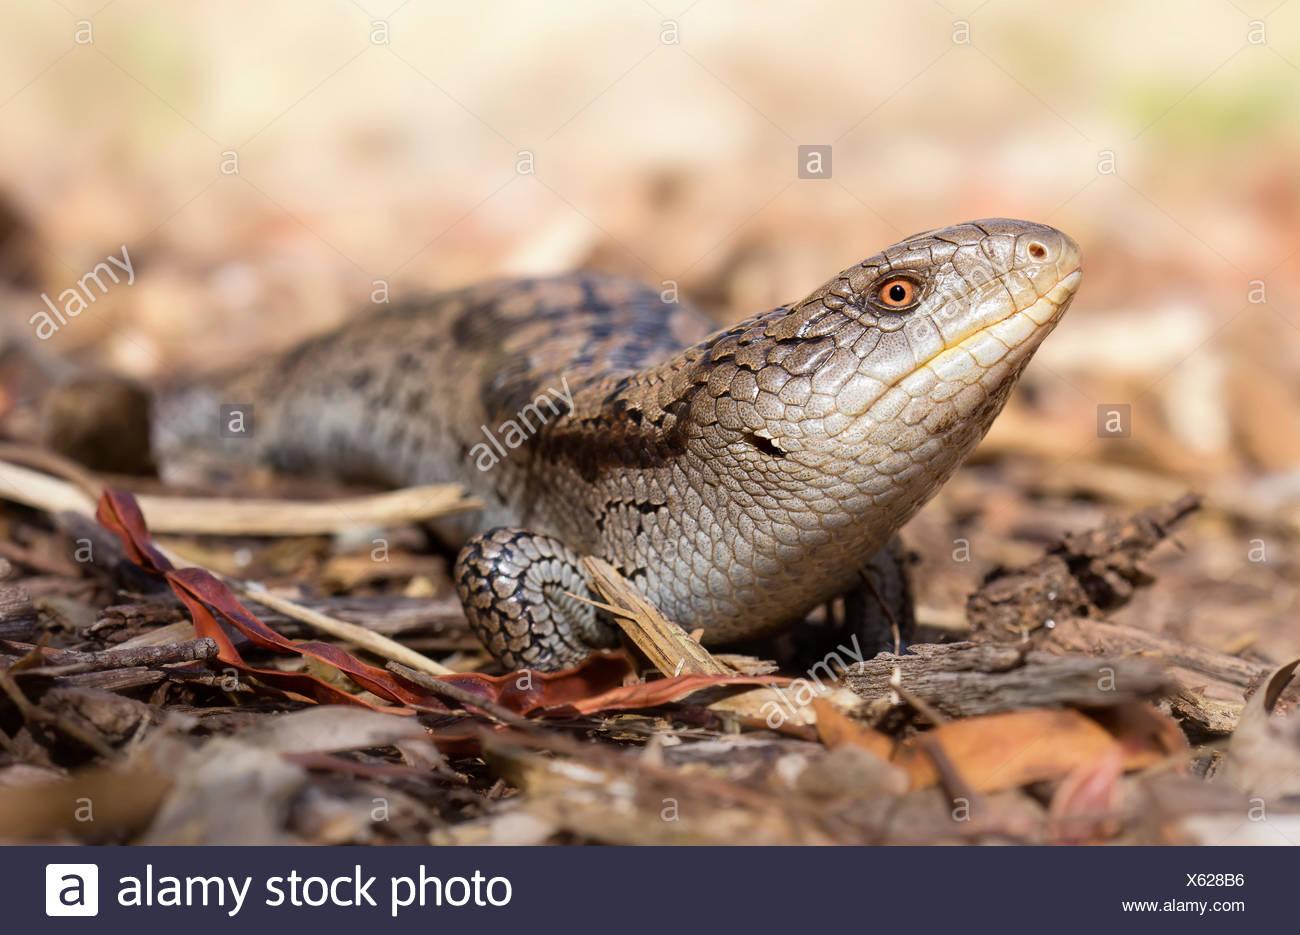 Australia, Blotched blue-tongue lizard crawling on ground Stock Photo